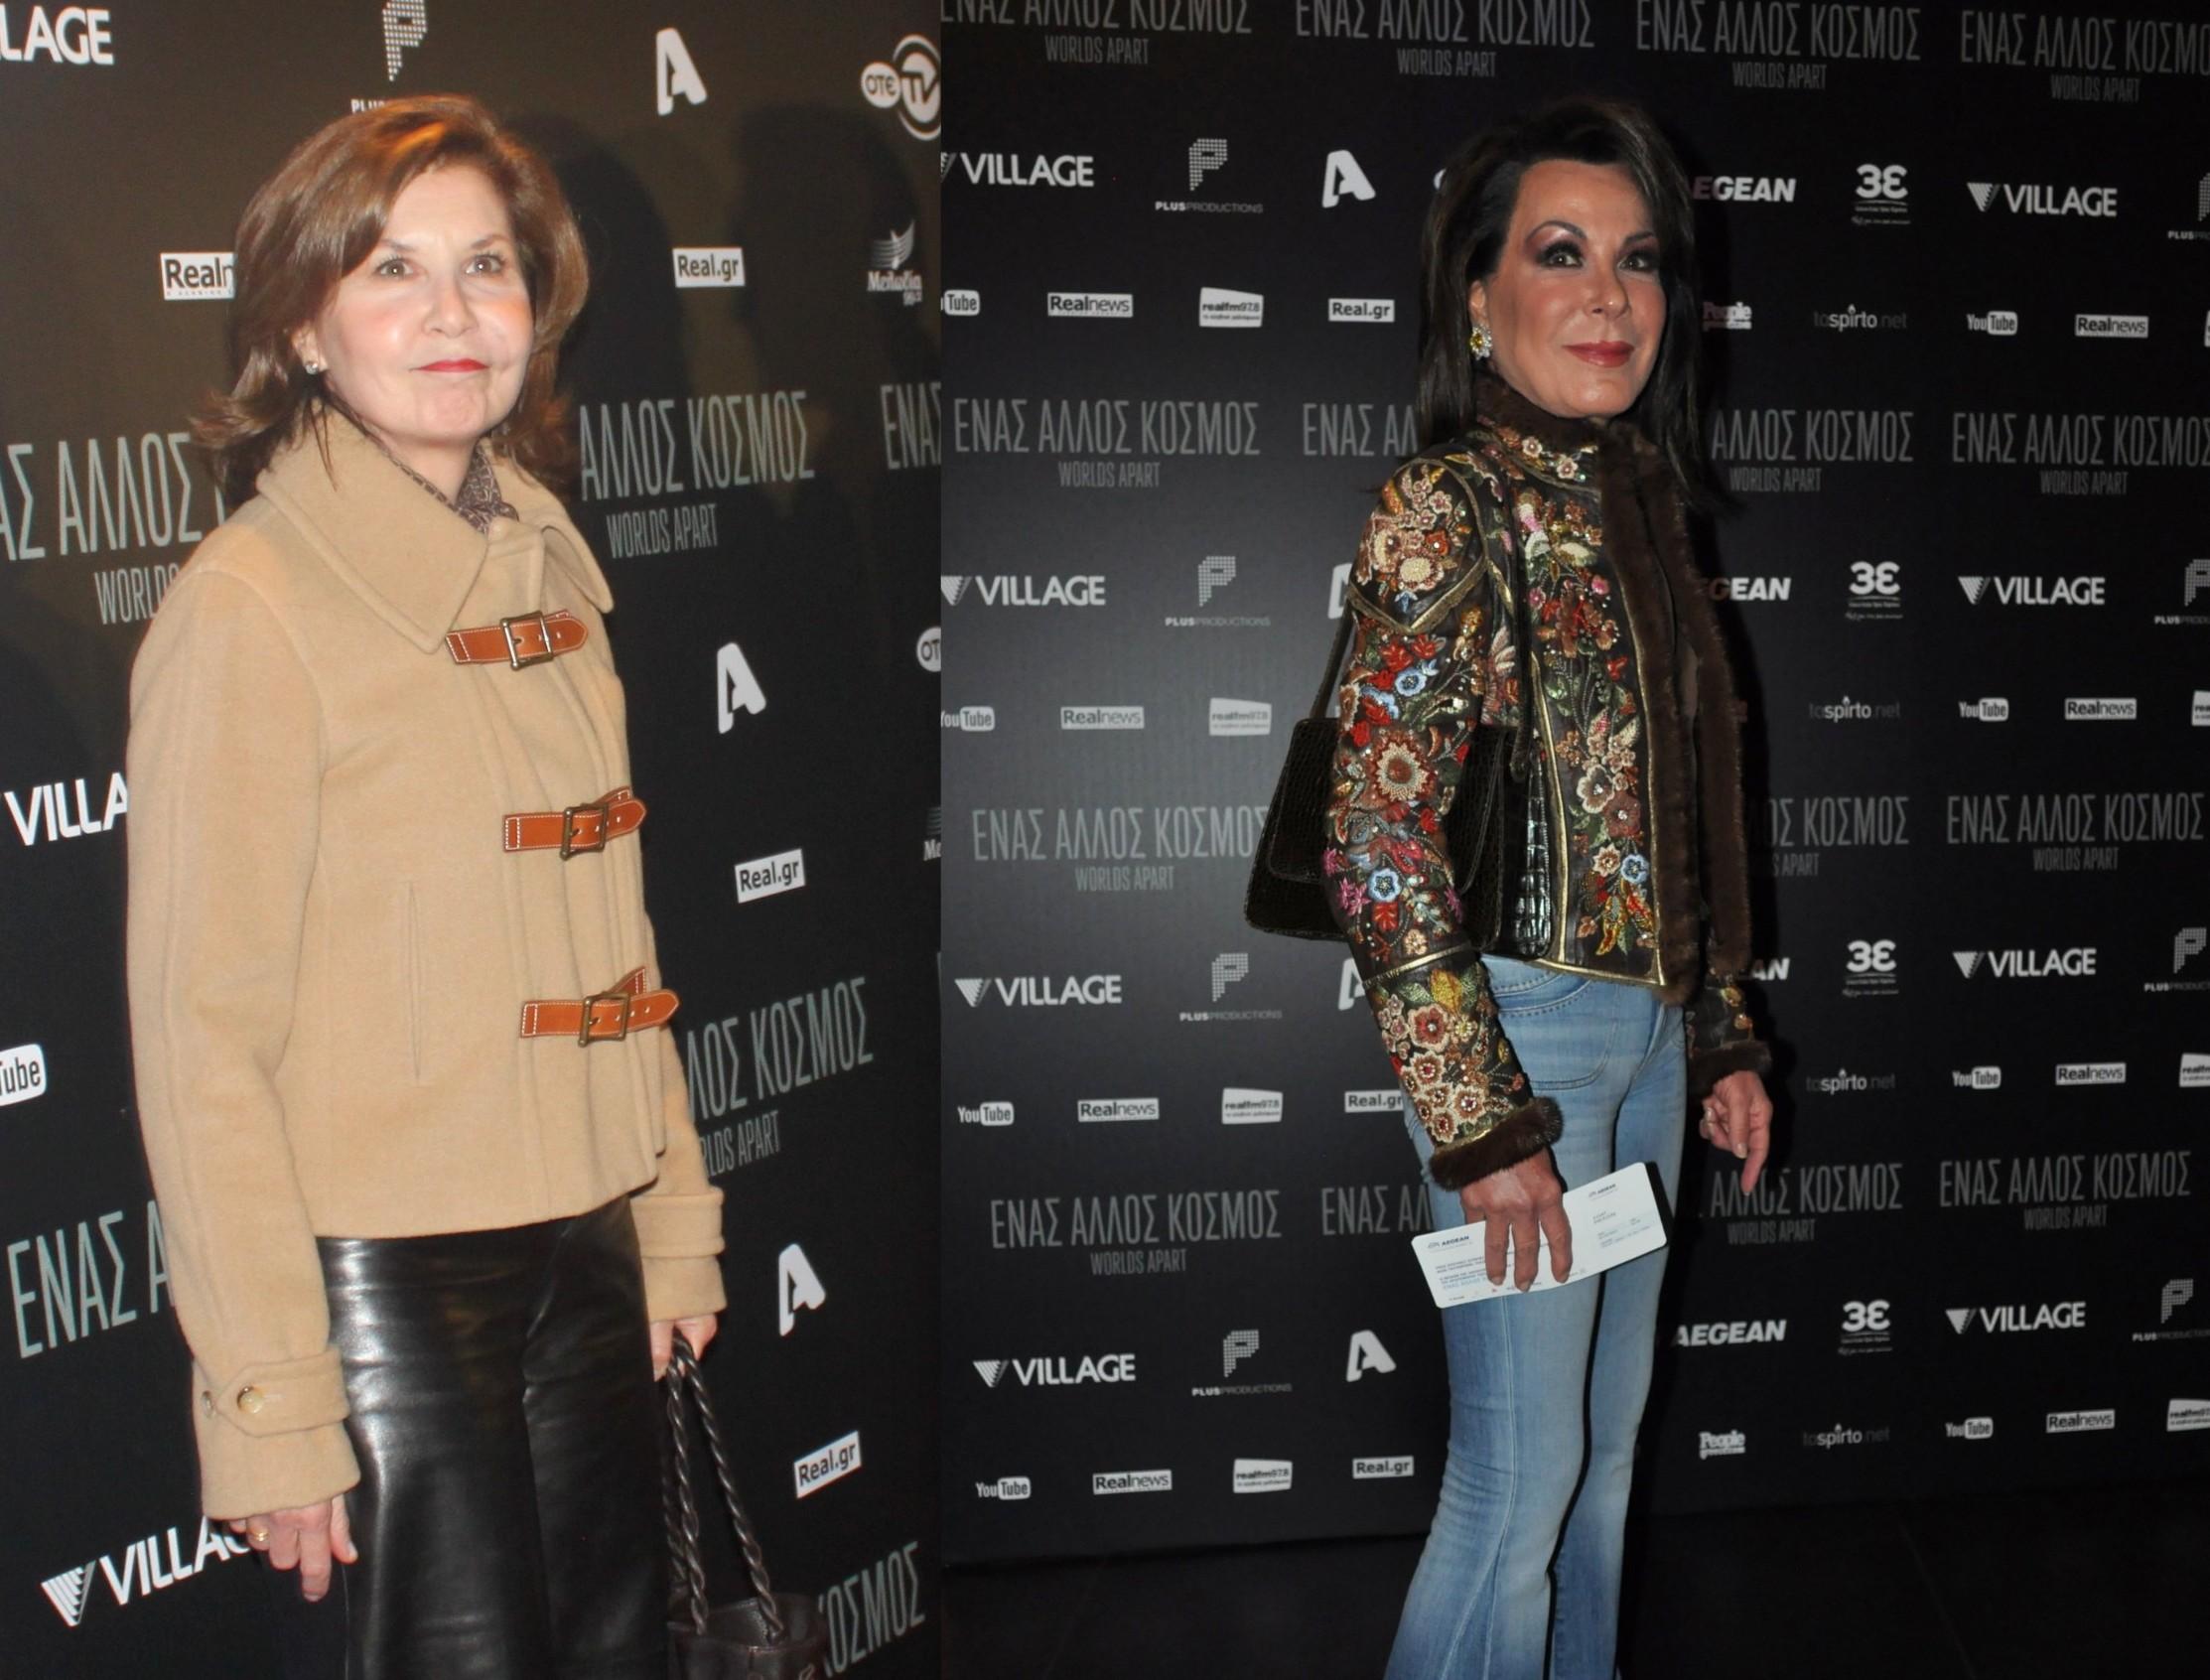 Family Affairs: Η Γιάννα Αγγελοπούλου-Δασκαλάκη με την αδελφή της